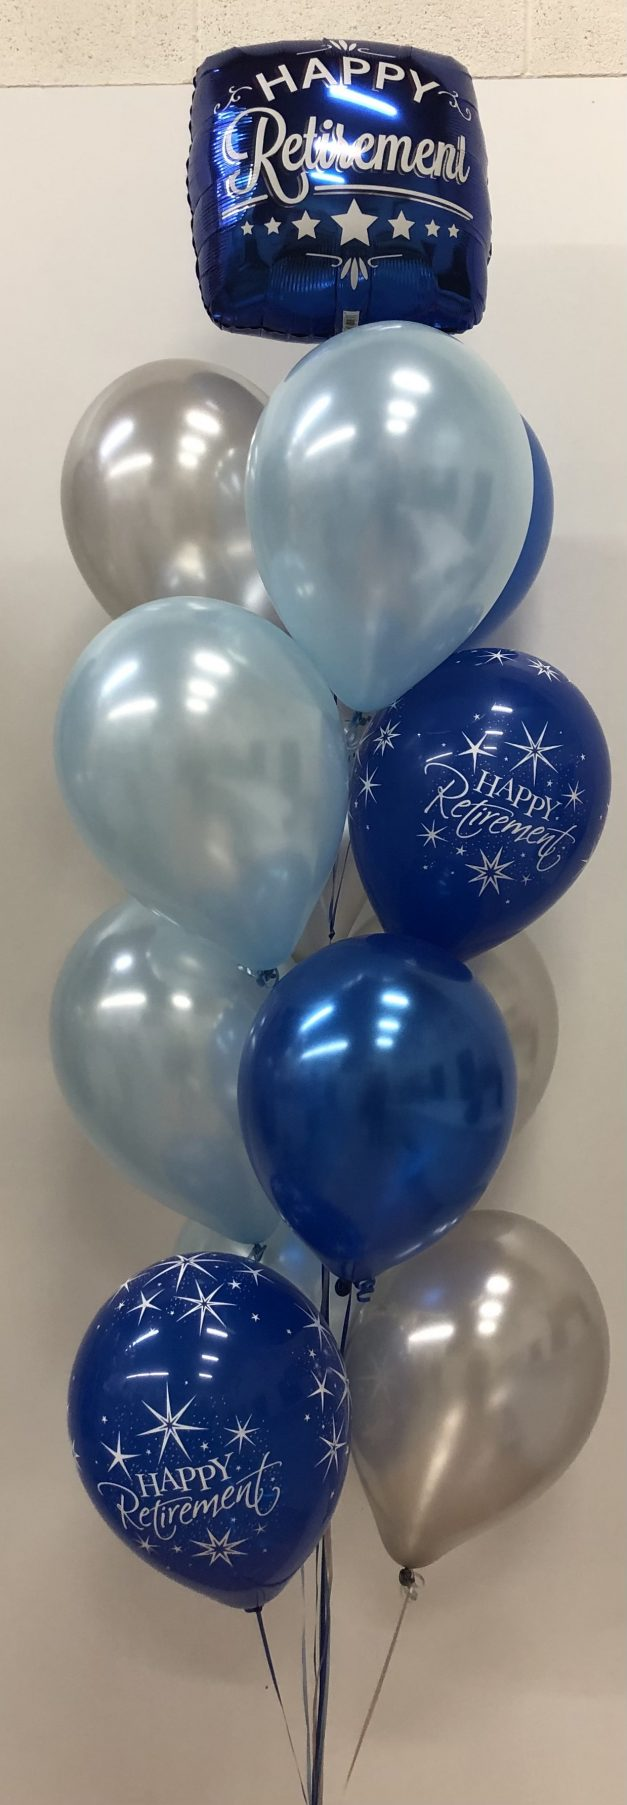 Retirement helium balloon pillar of 13